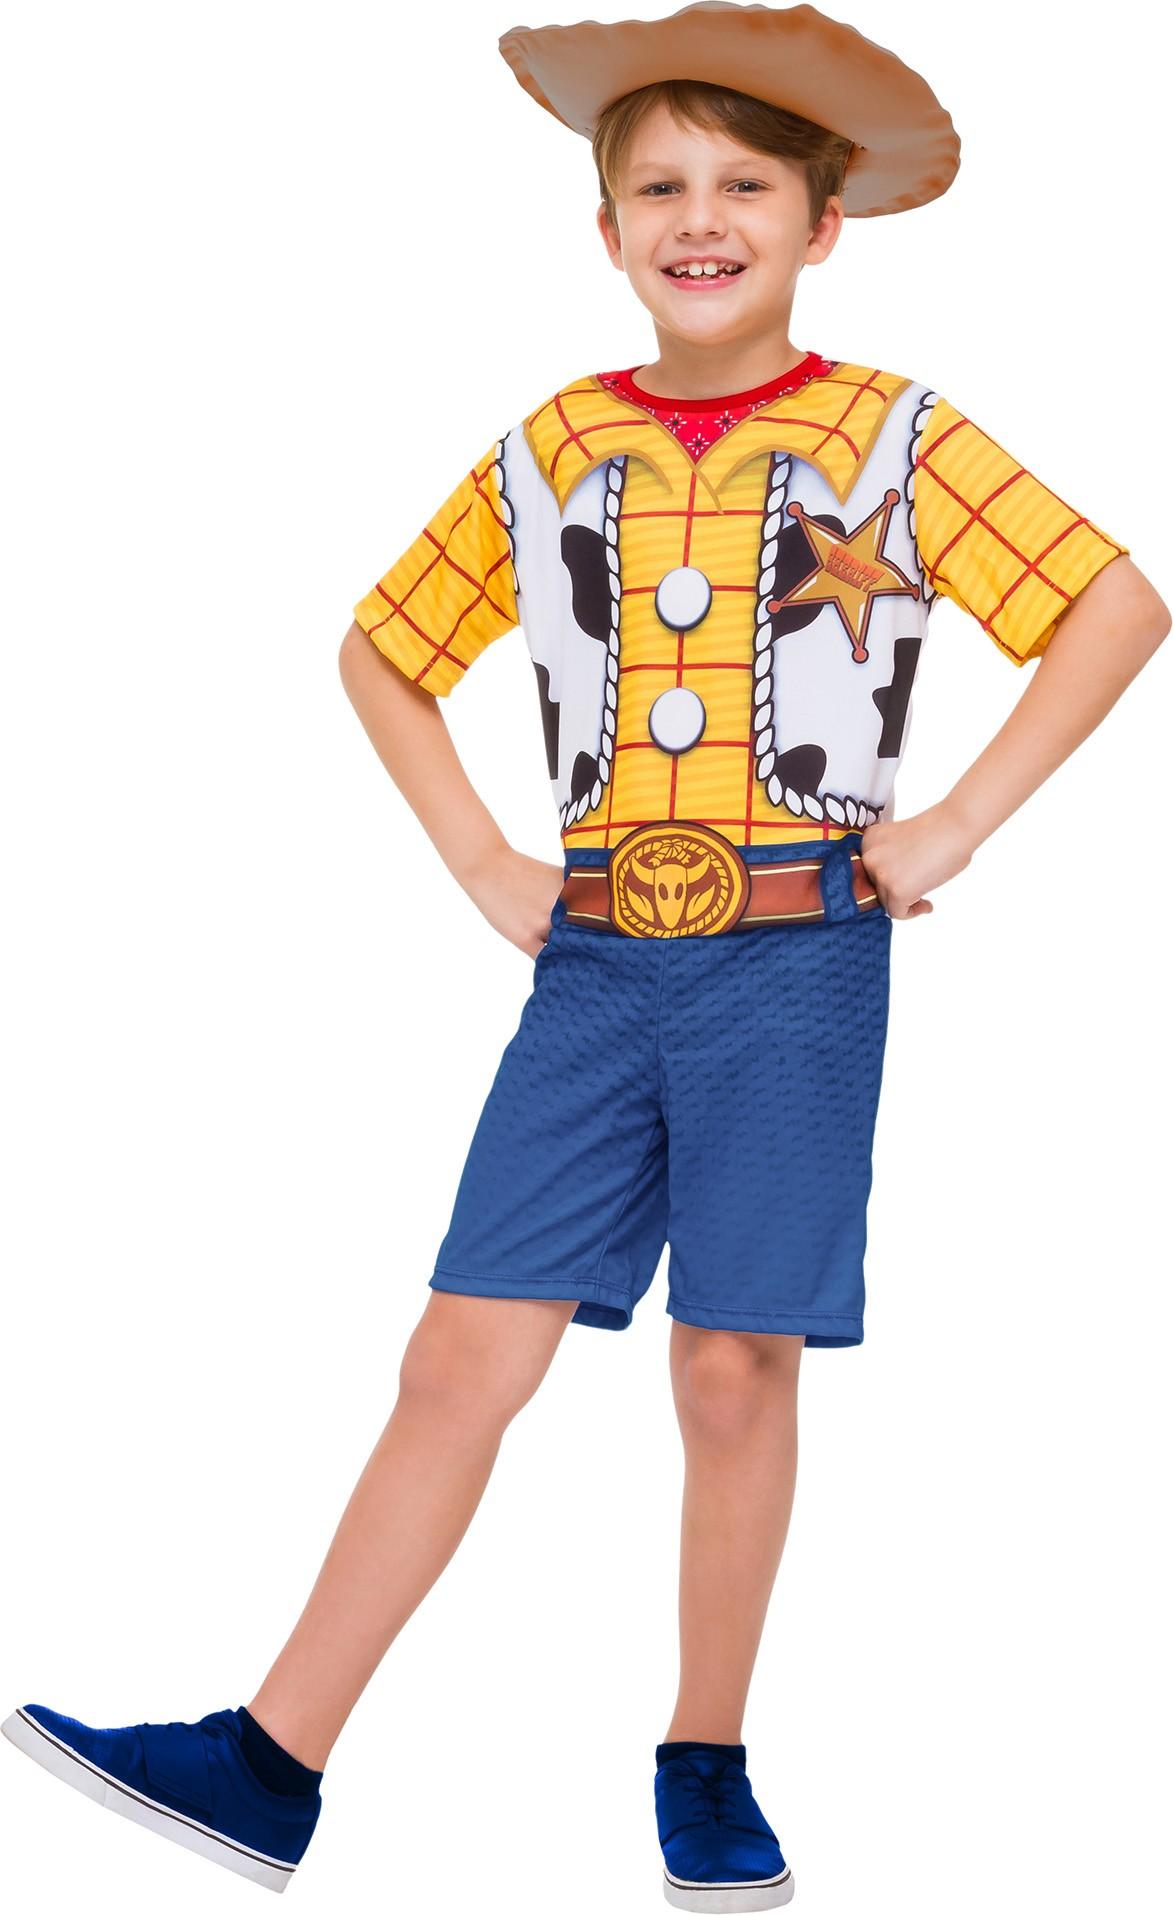 Fantasia Woody Curta Cowboy Toy Story 3 Com Chapeu Infantil